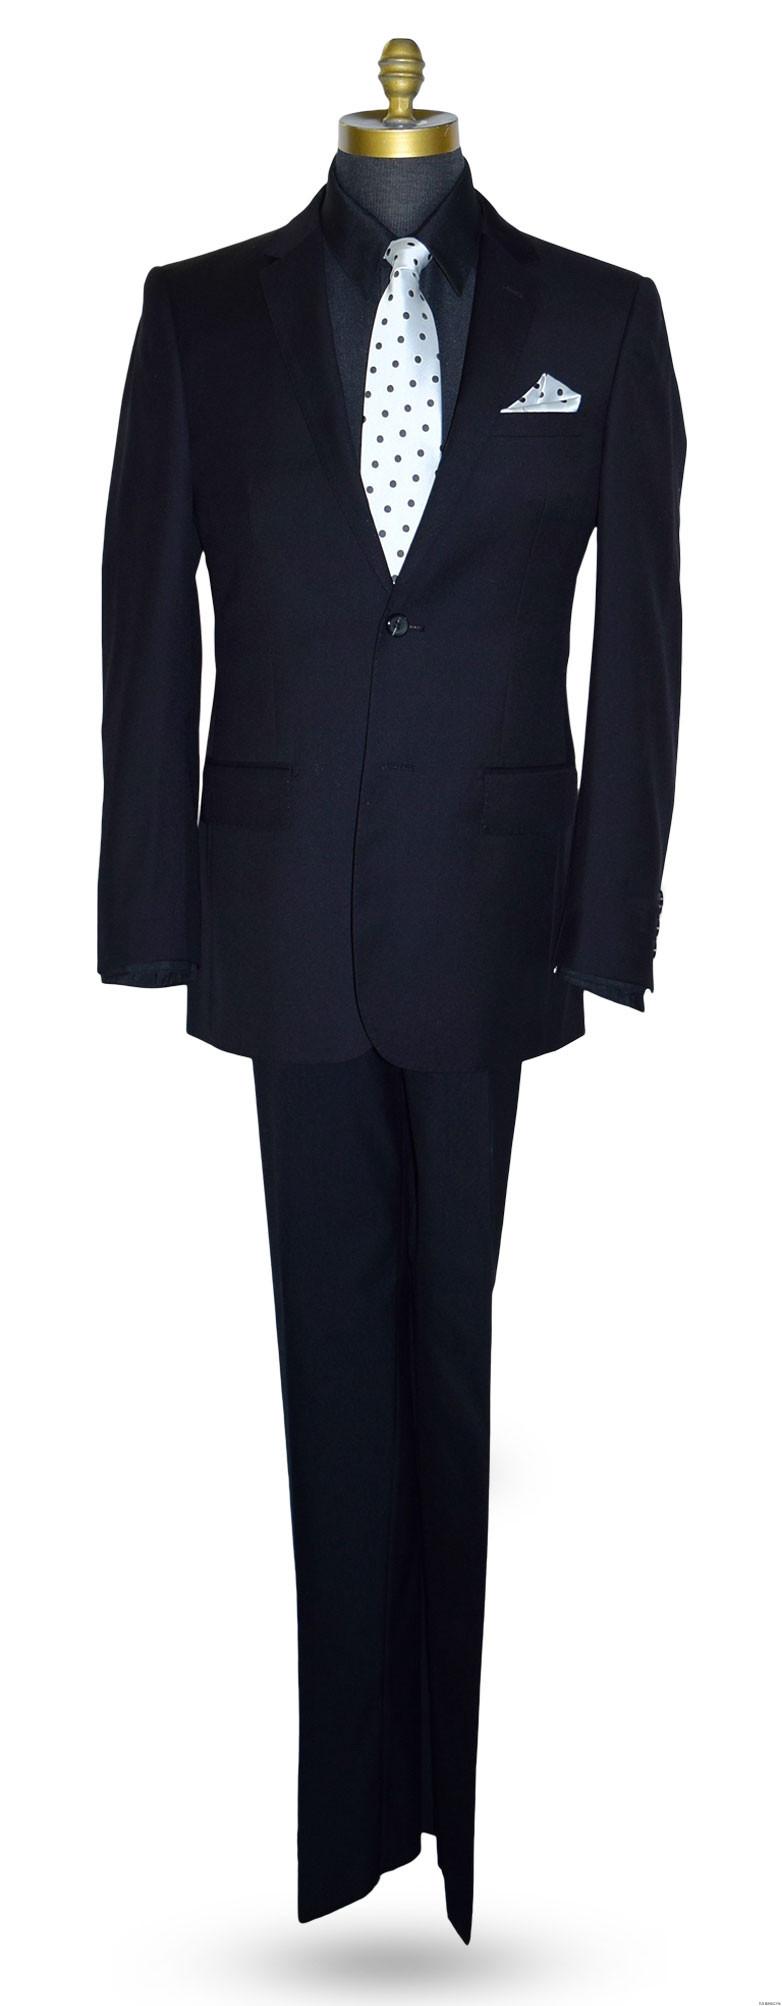 men's polka dot dress tie with black suit at TuxBling.com